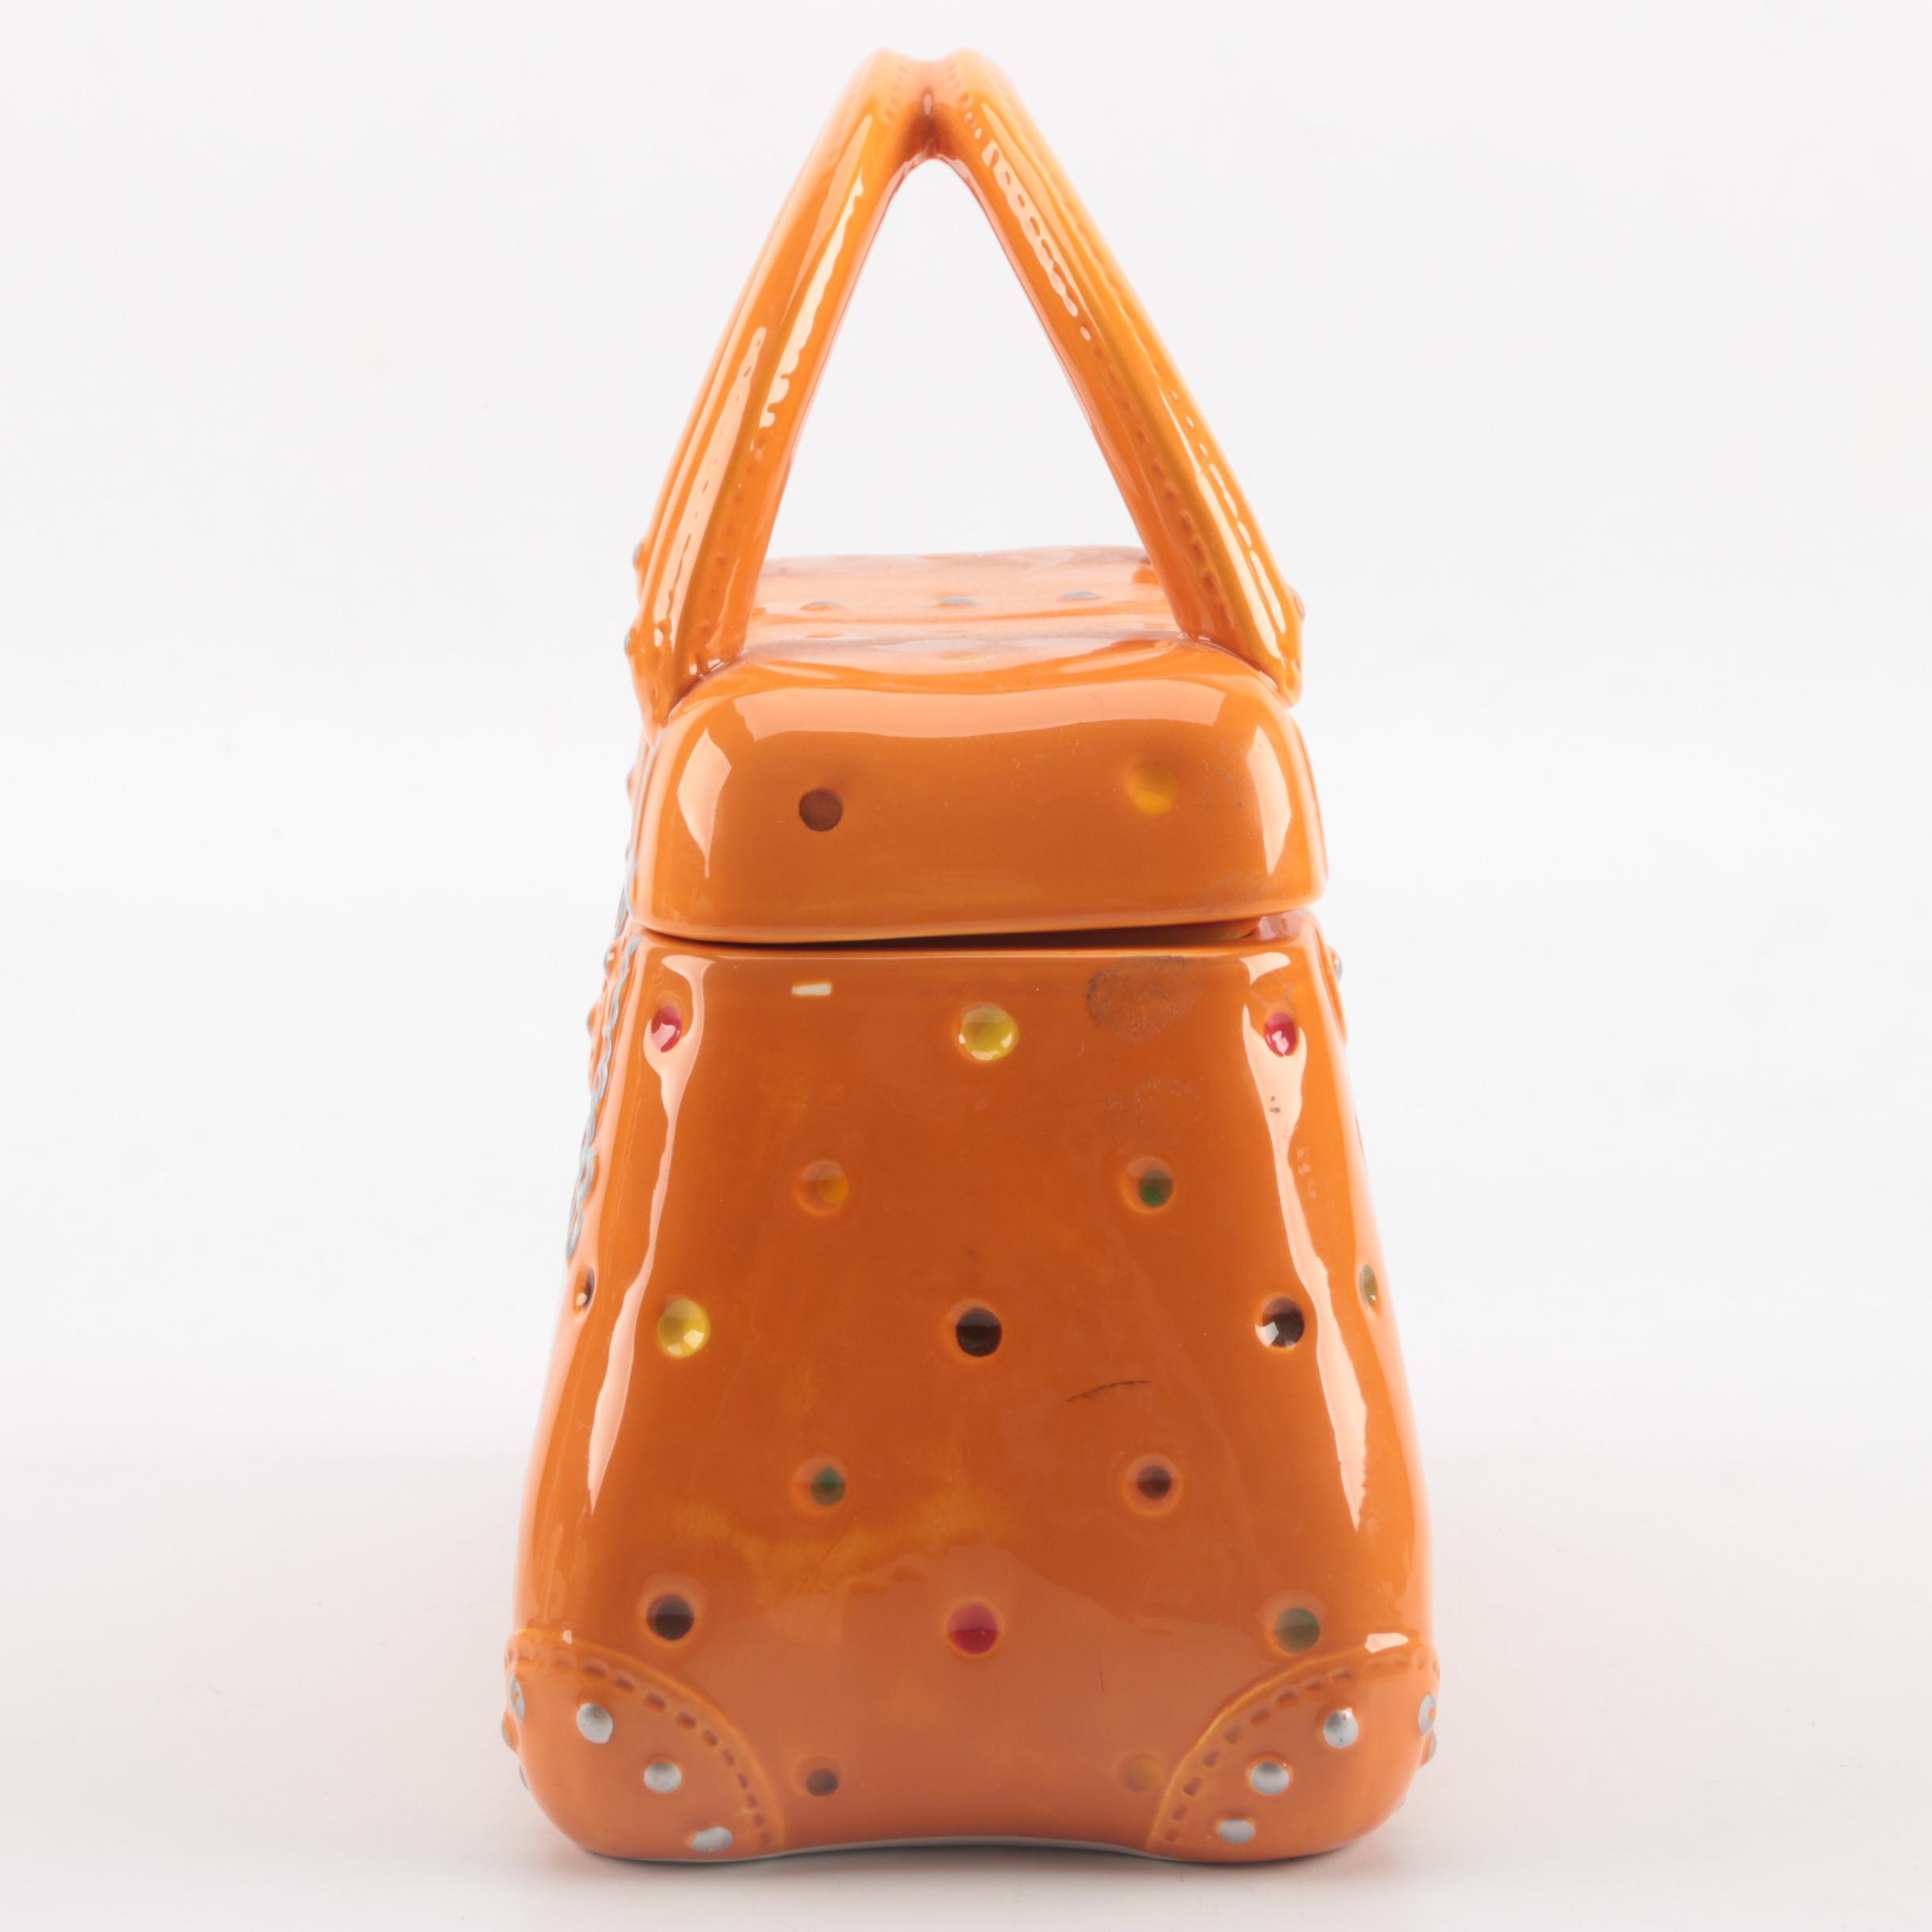 Temp Tations Presentable Ovenware Orange Ceramic Purse Ebth